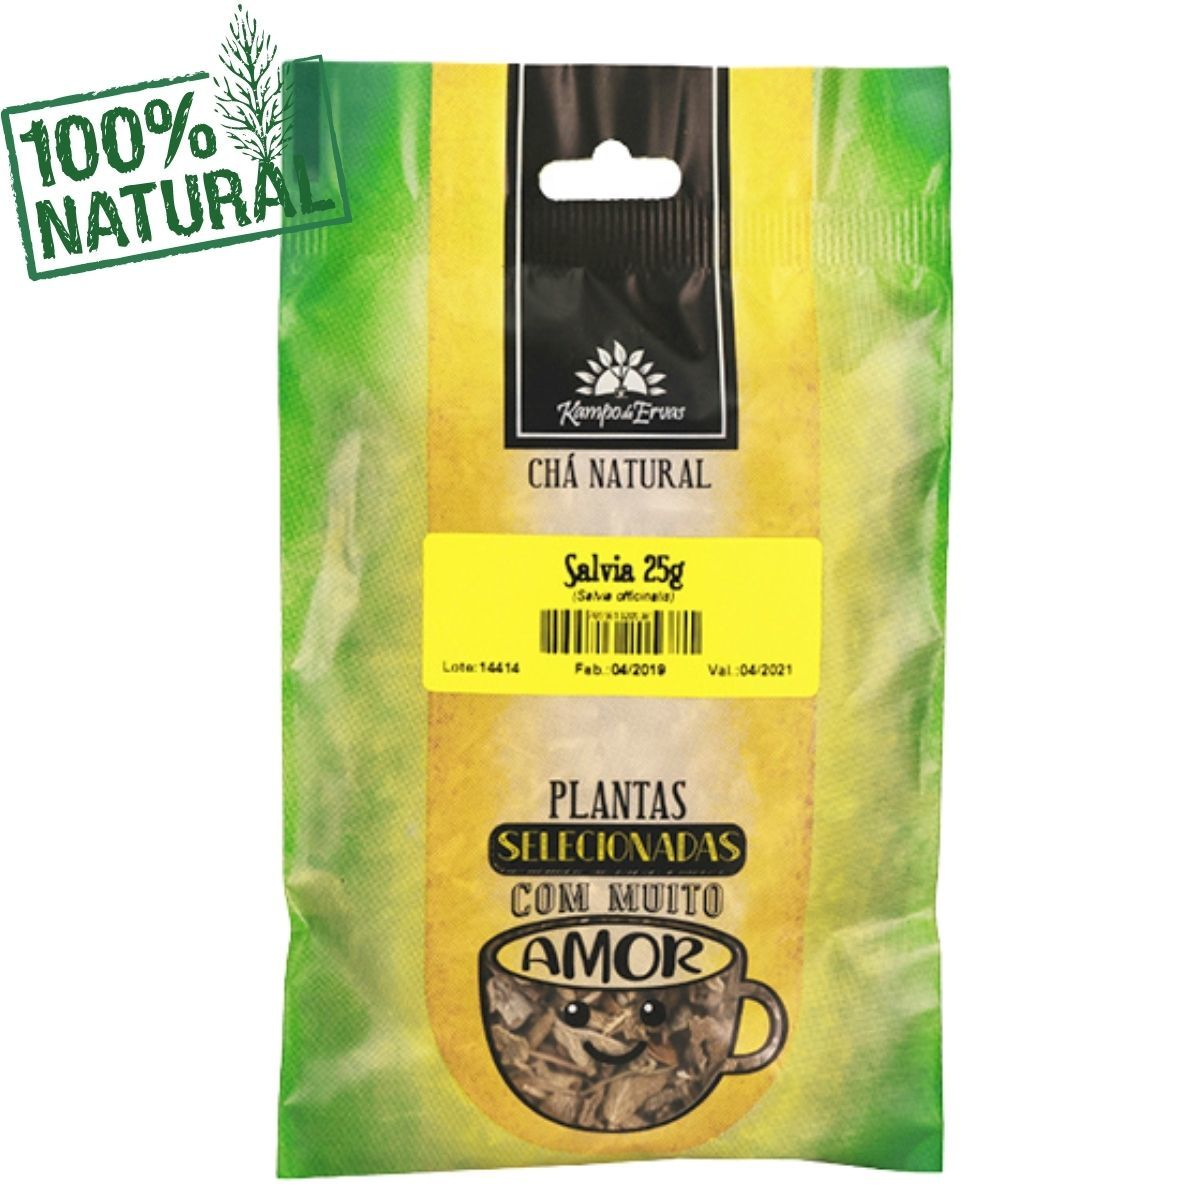 Sálvia Chá Natural só Folhas Kampo de Ervas 25 gramas